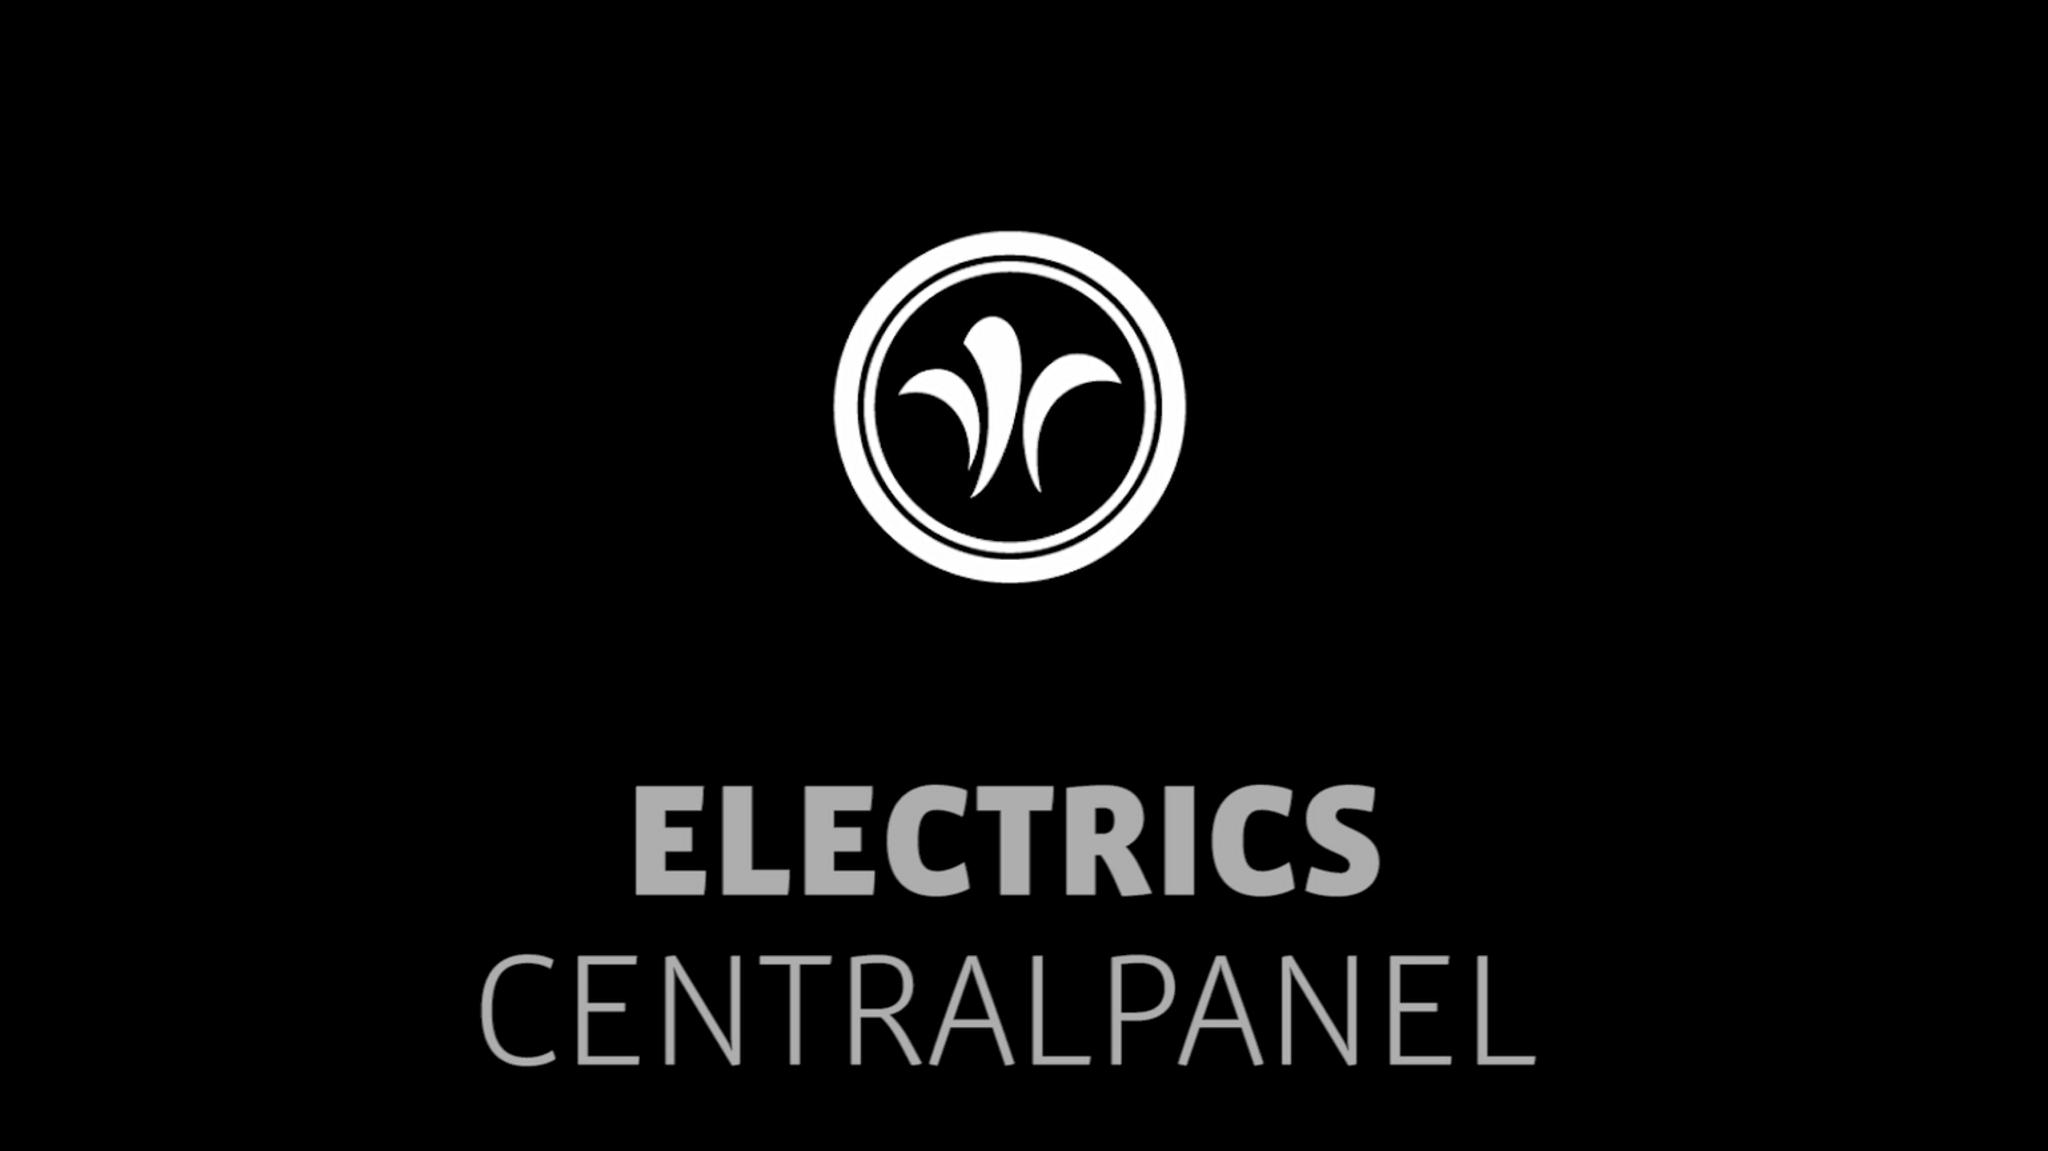 motorhome central panel // niesmann+bischoff - camper (model ARTO) // 2019 // EL1